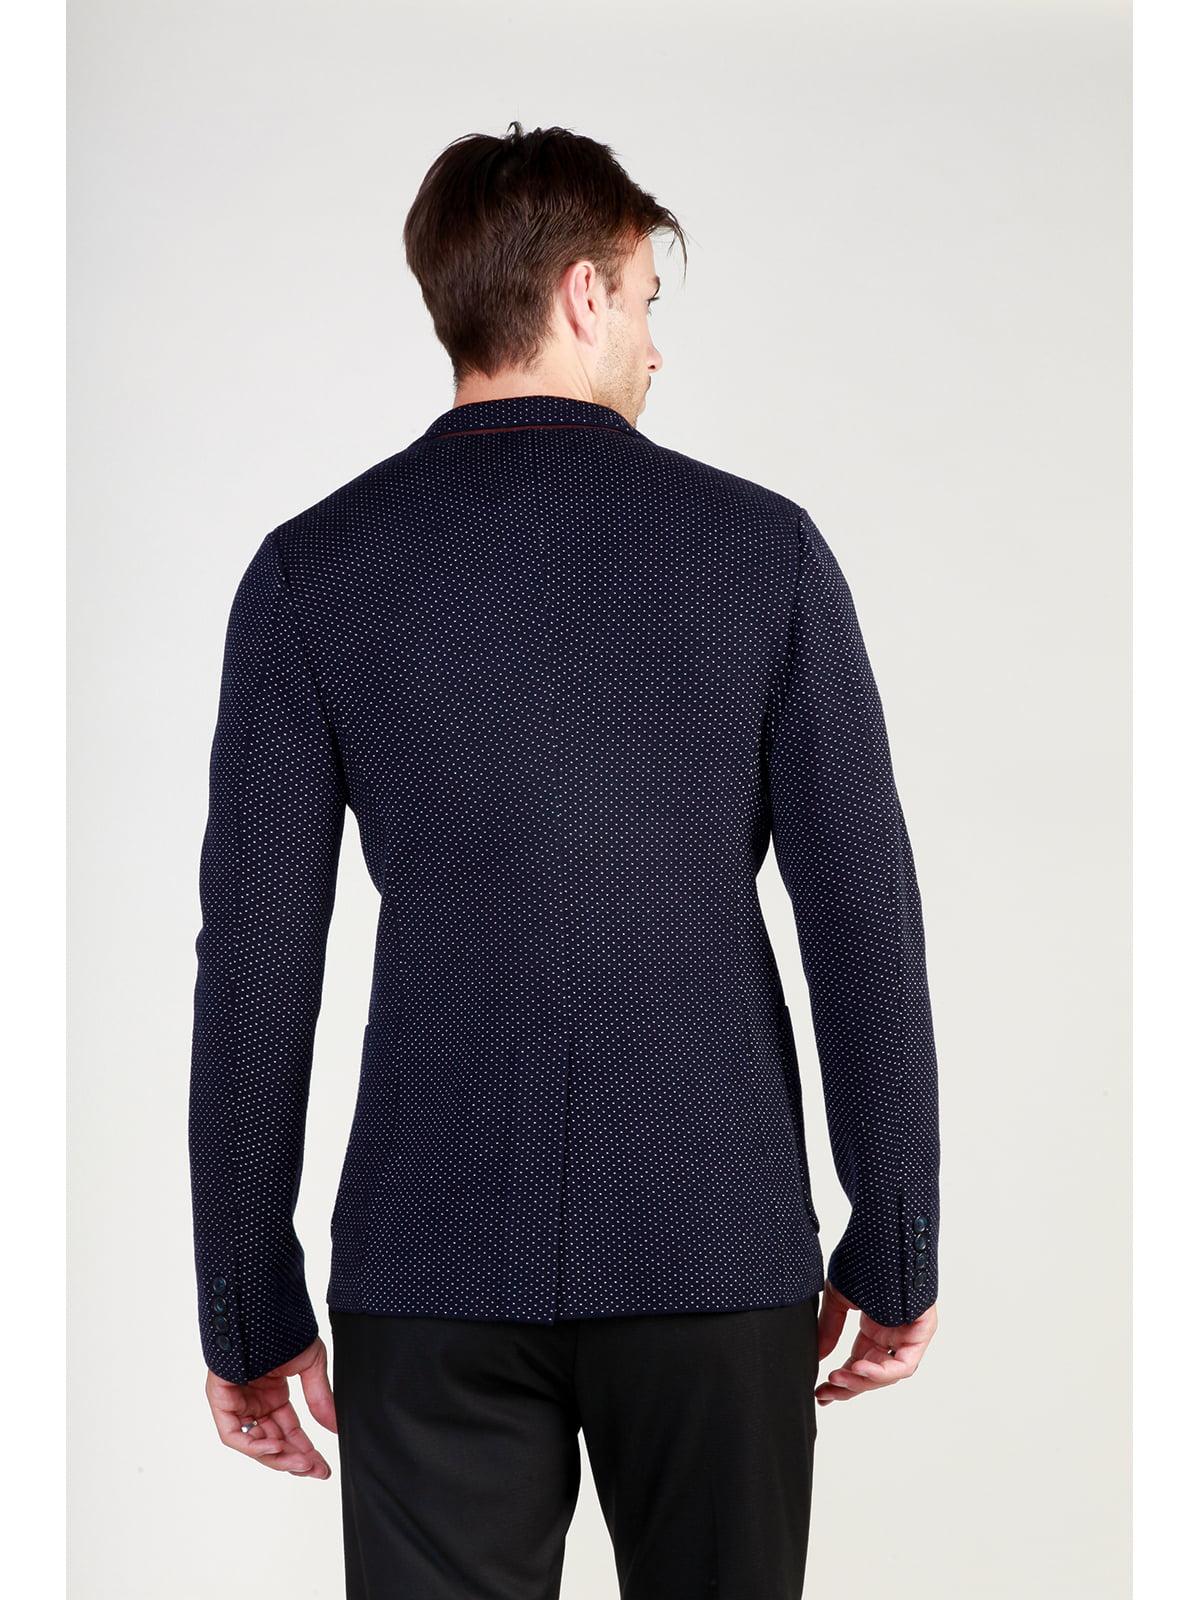 Пиджак темно-синий в рисунок | 3748934 | фото 5